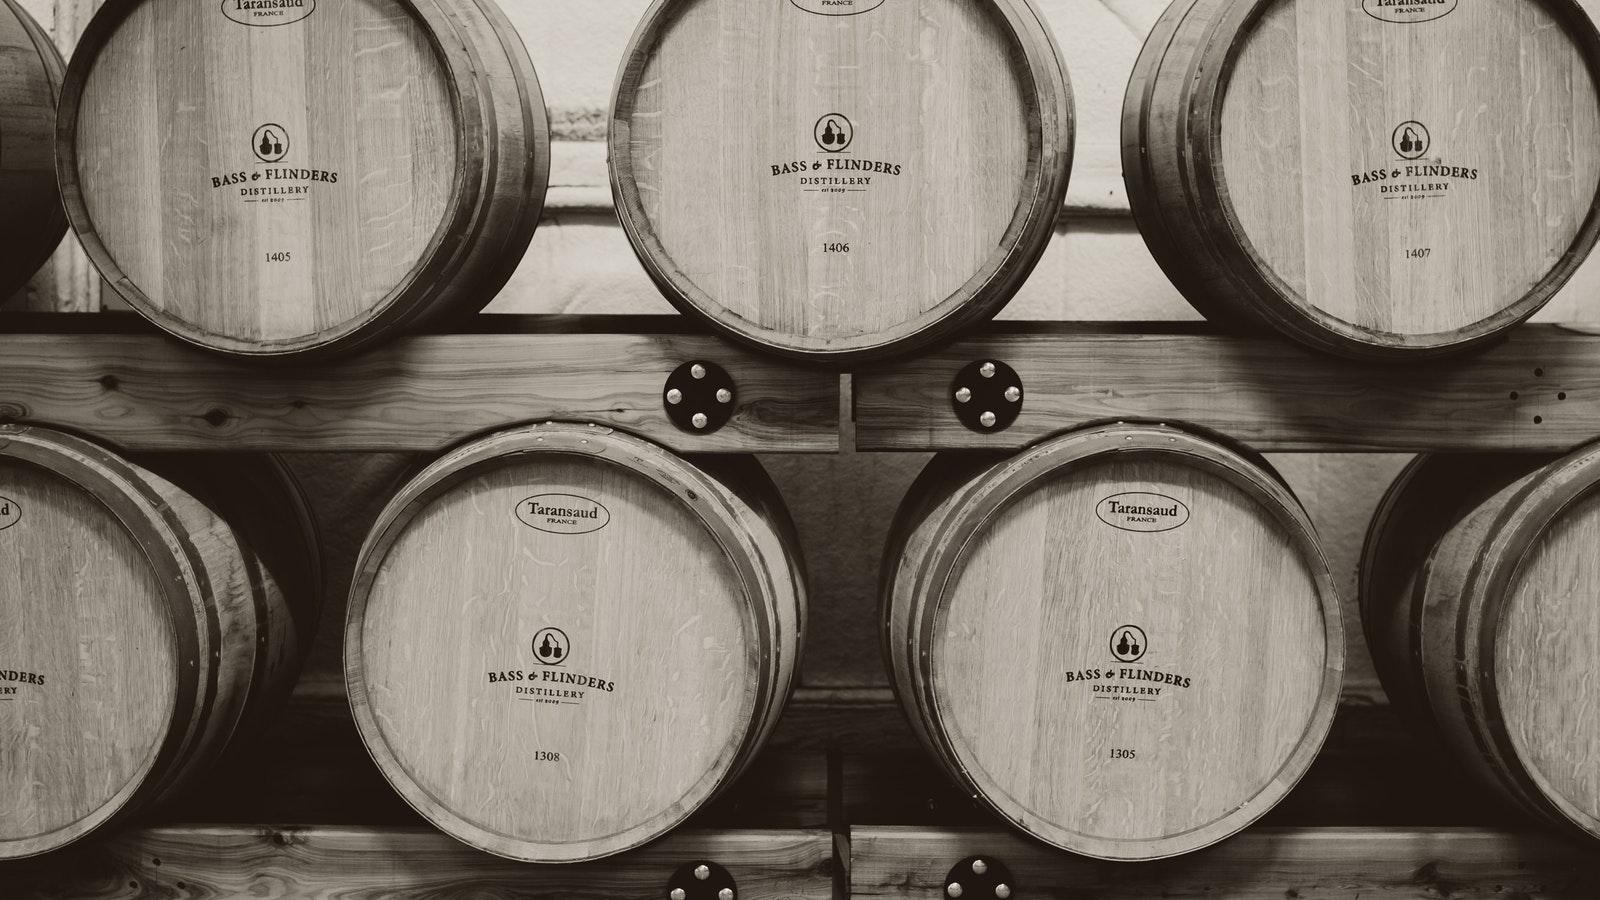 Bass and Flinders Distillery